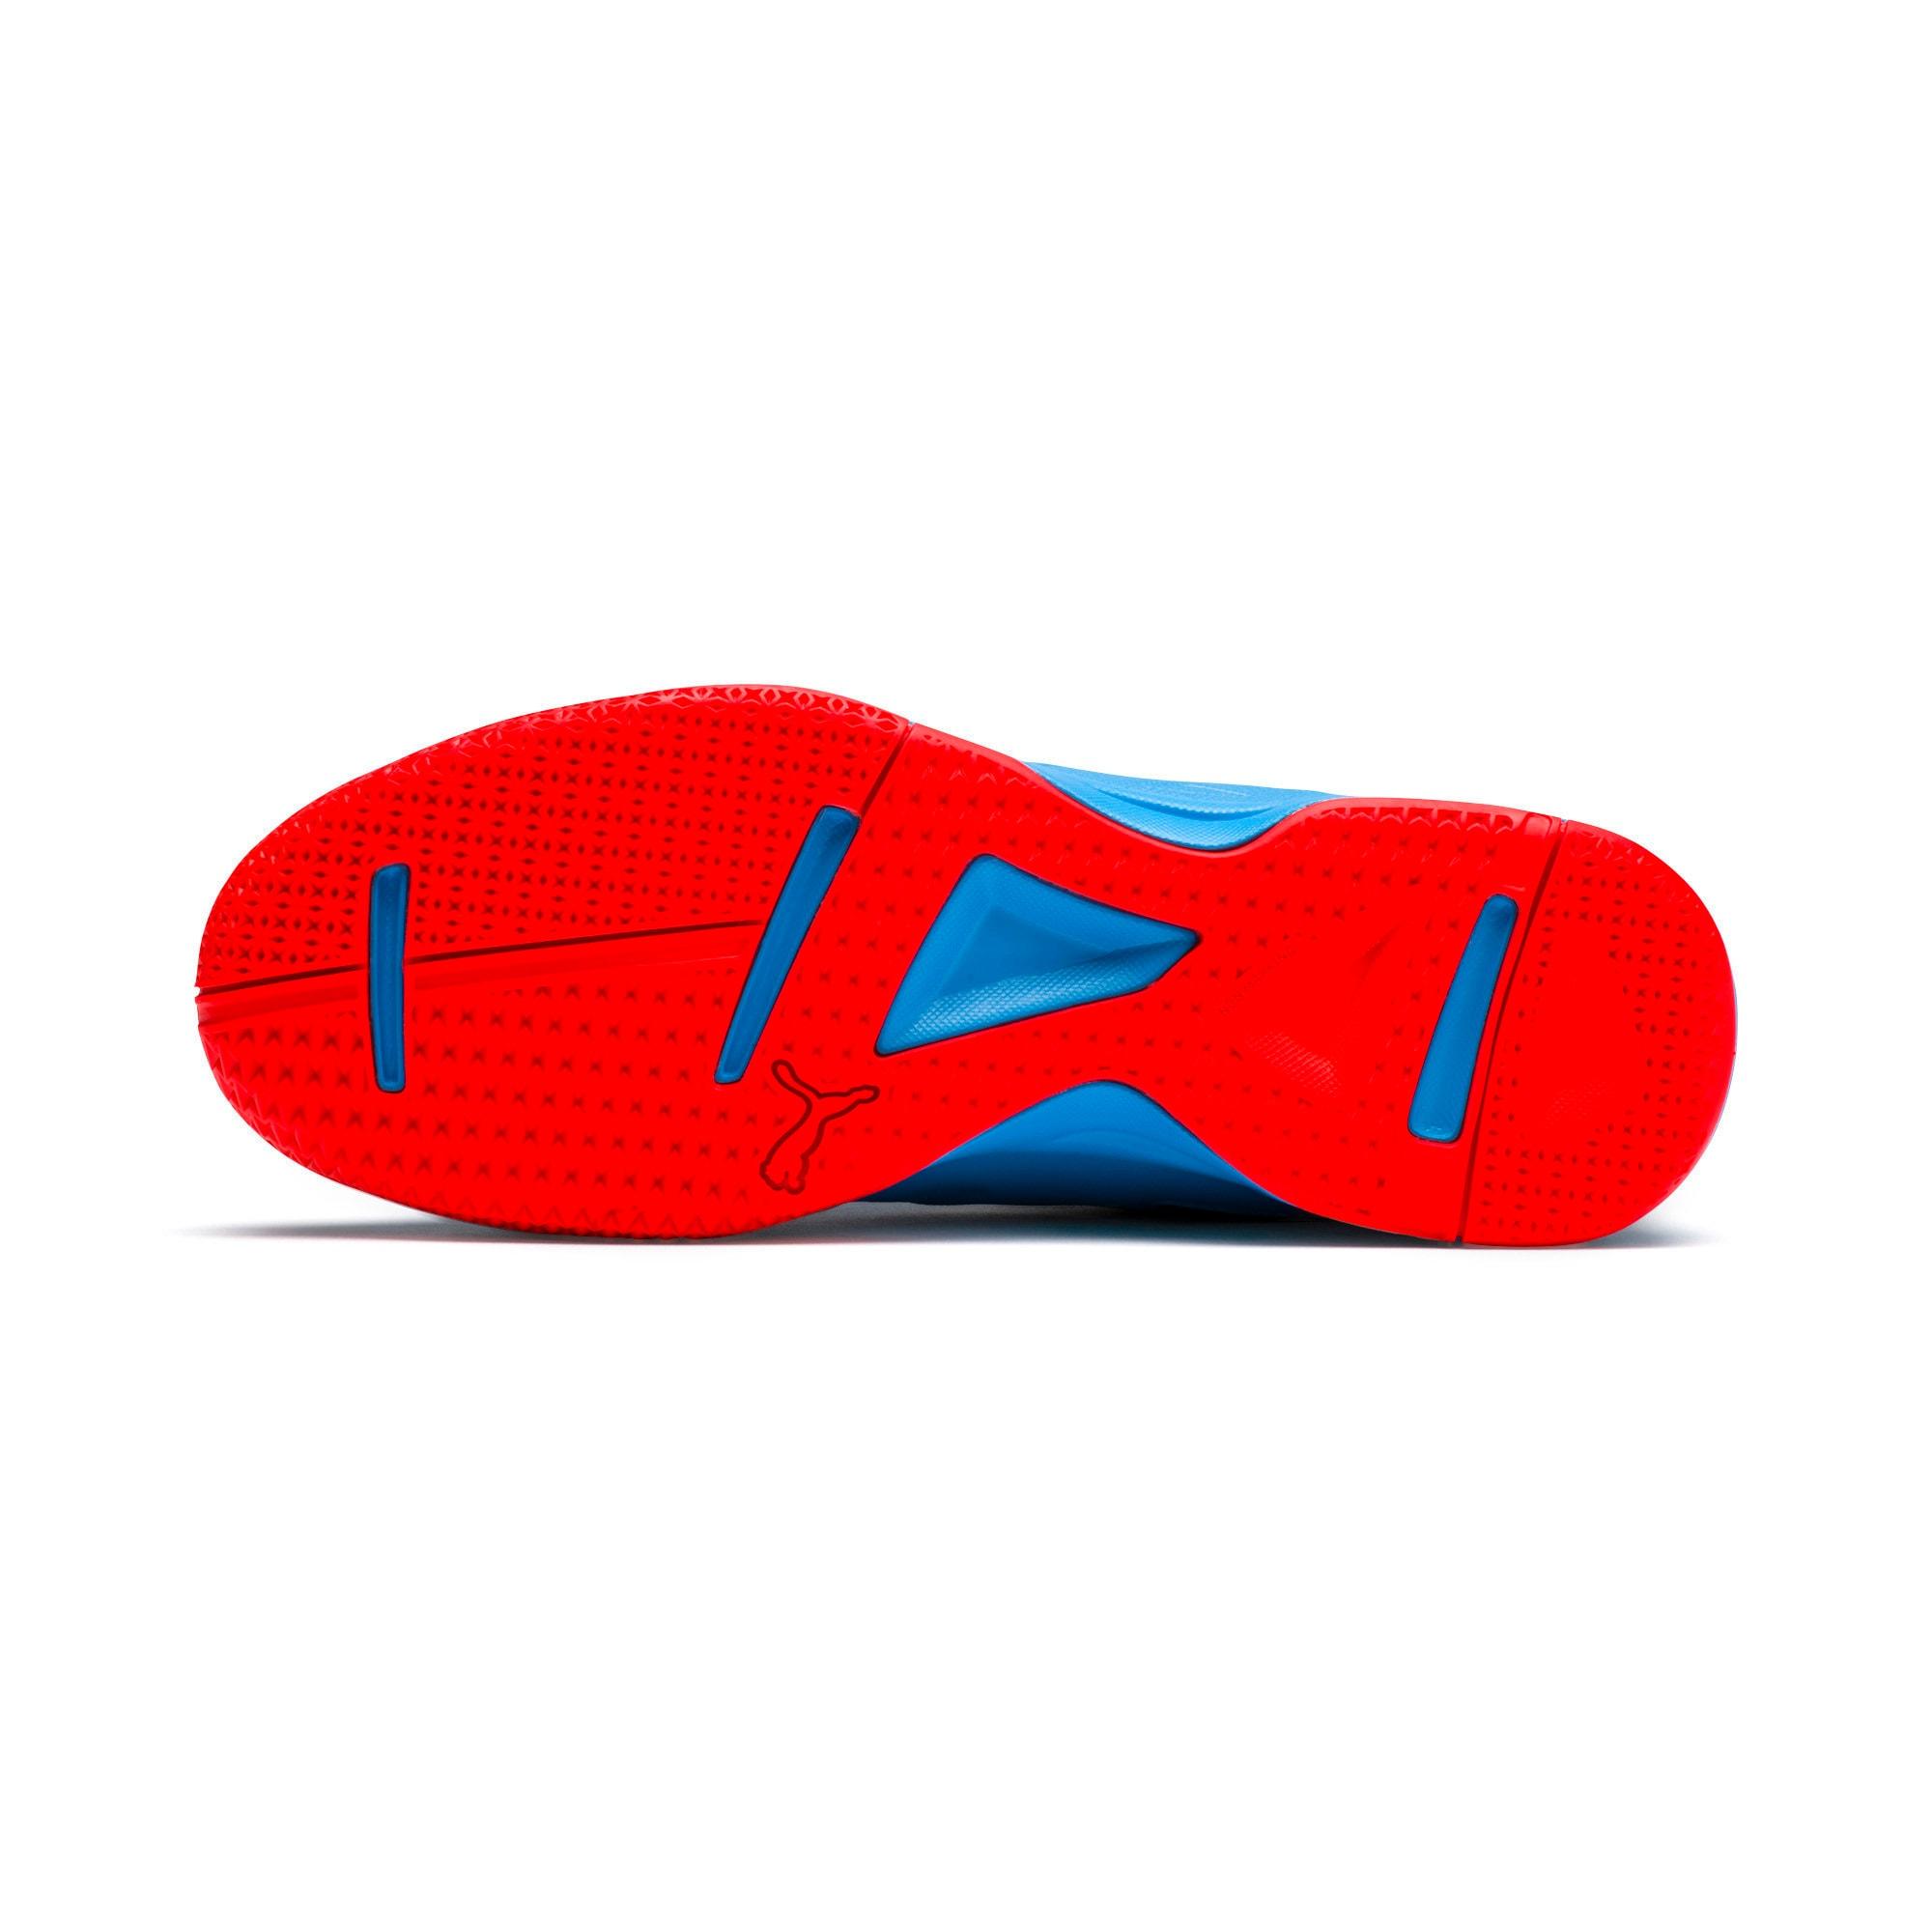 Thumbnail 5 of Tenaz Indoor Teamsport Shoes, Bleu Azur-White-Black-Red, medium-IND